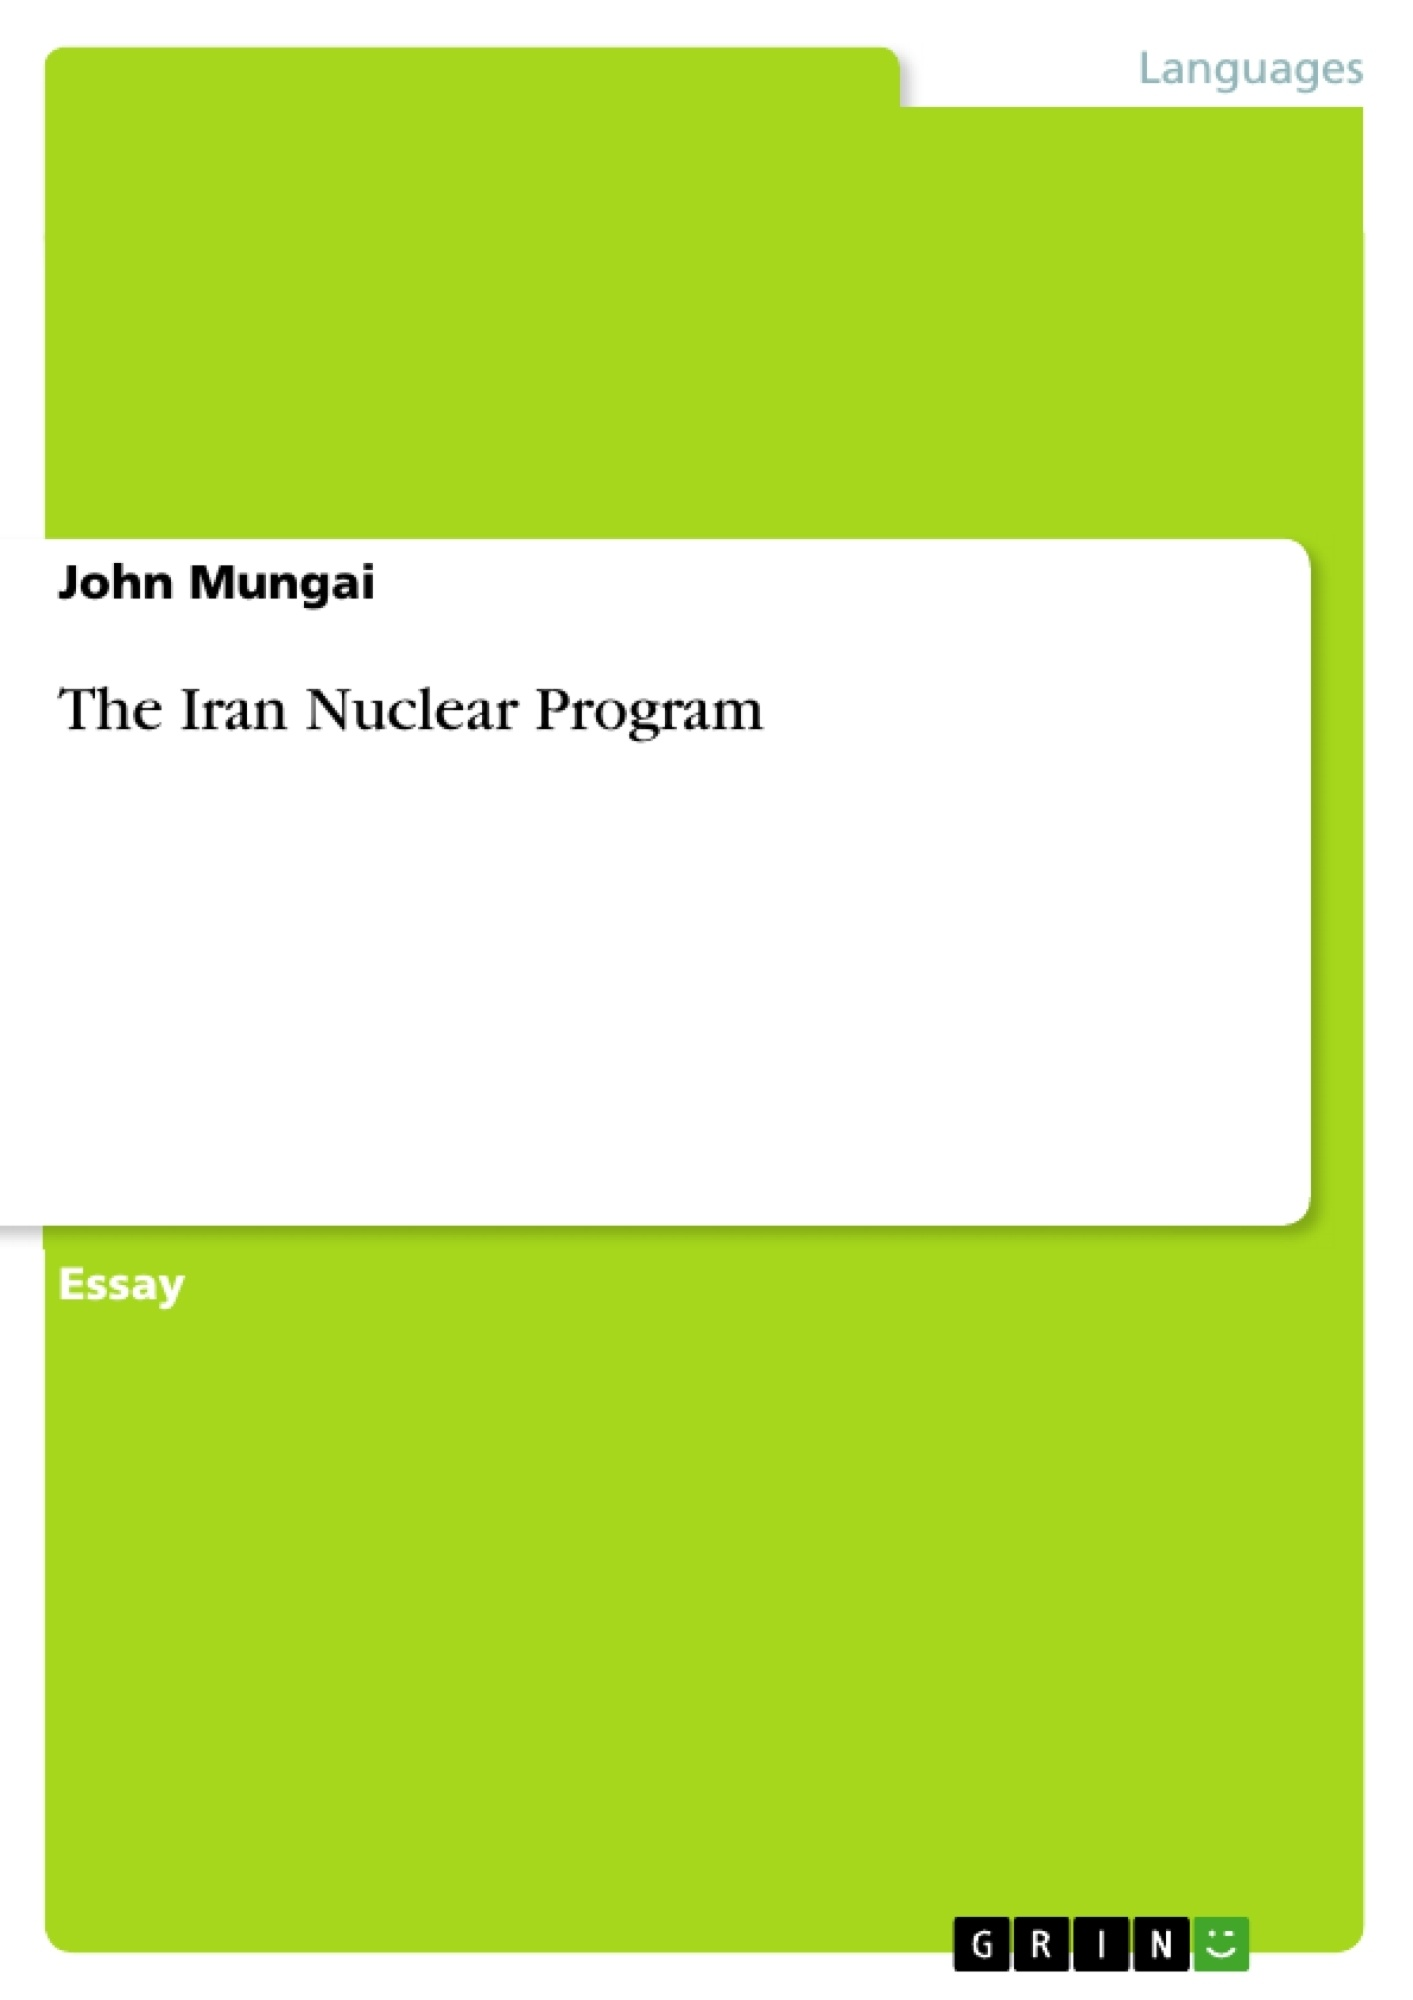 Title: The Iran Nuclear Program